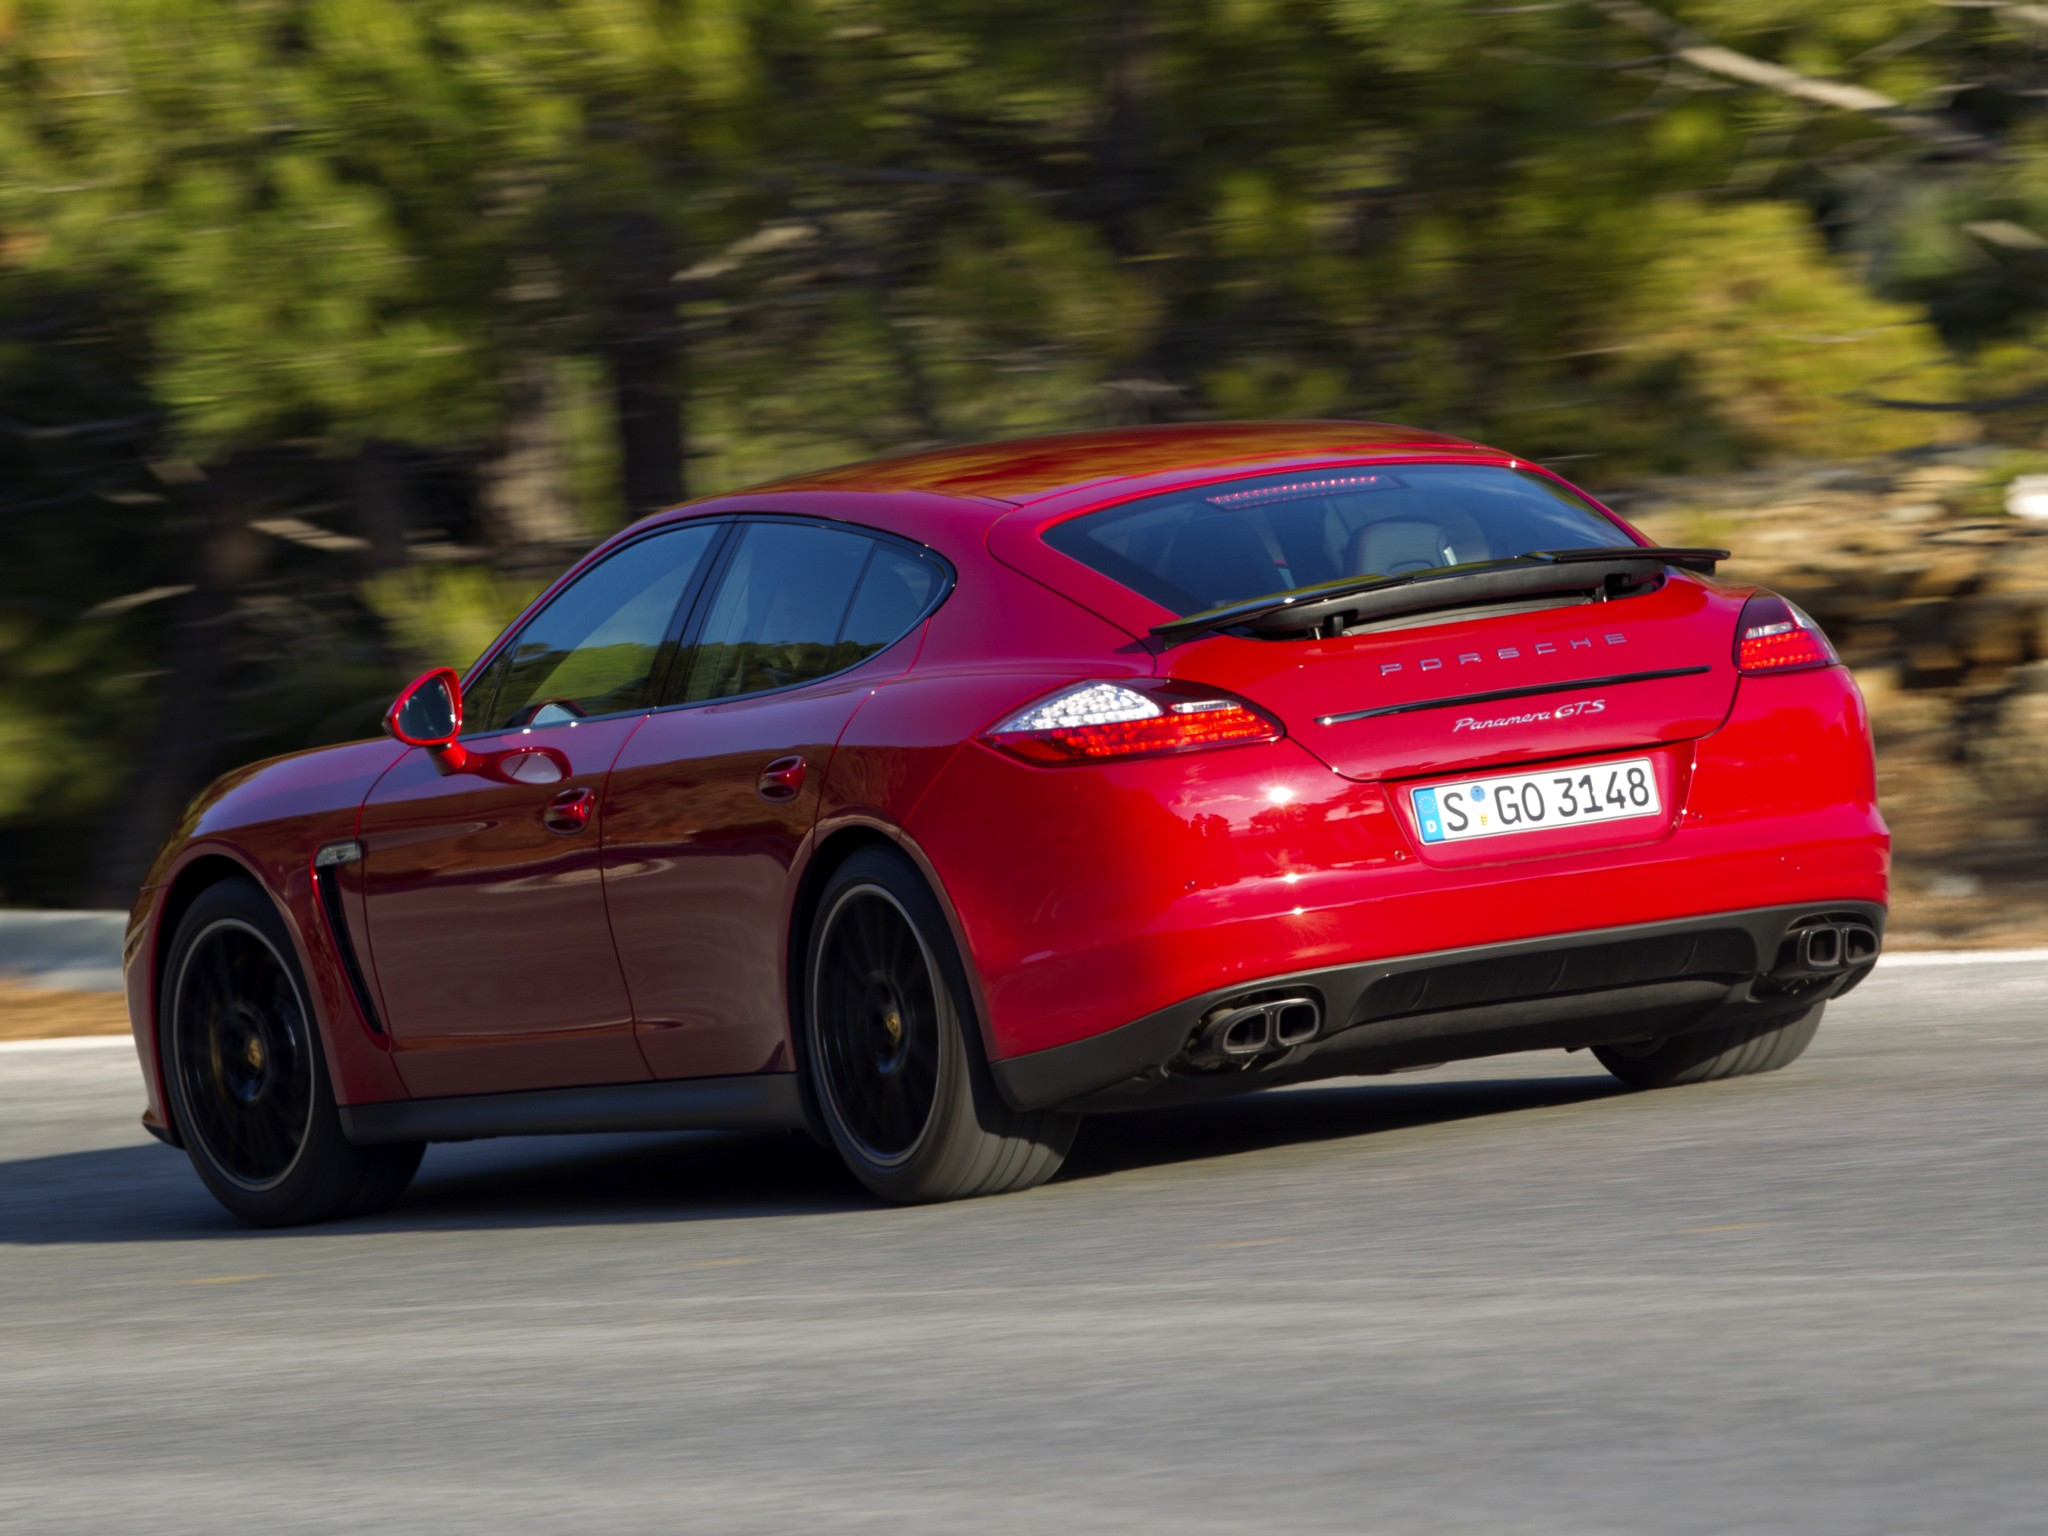 Porsche Panamera Gts 2011 2012 2013 2014 2015 2016